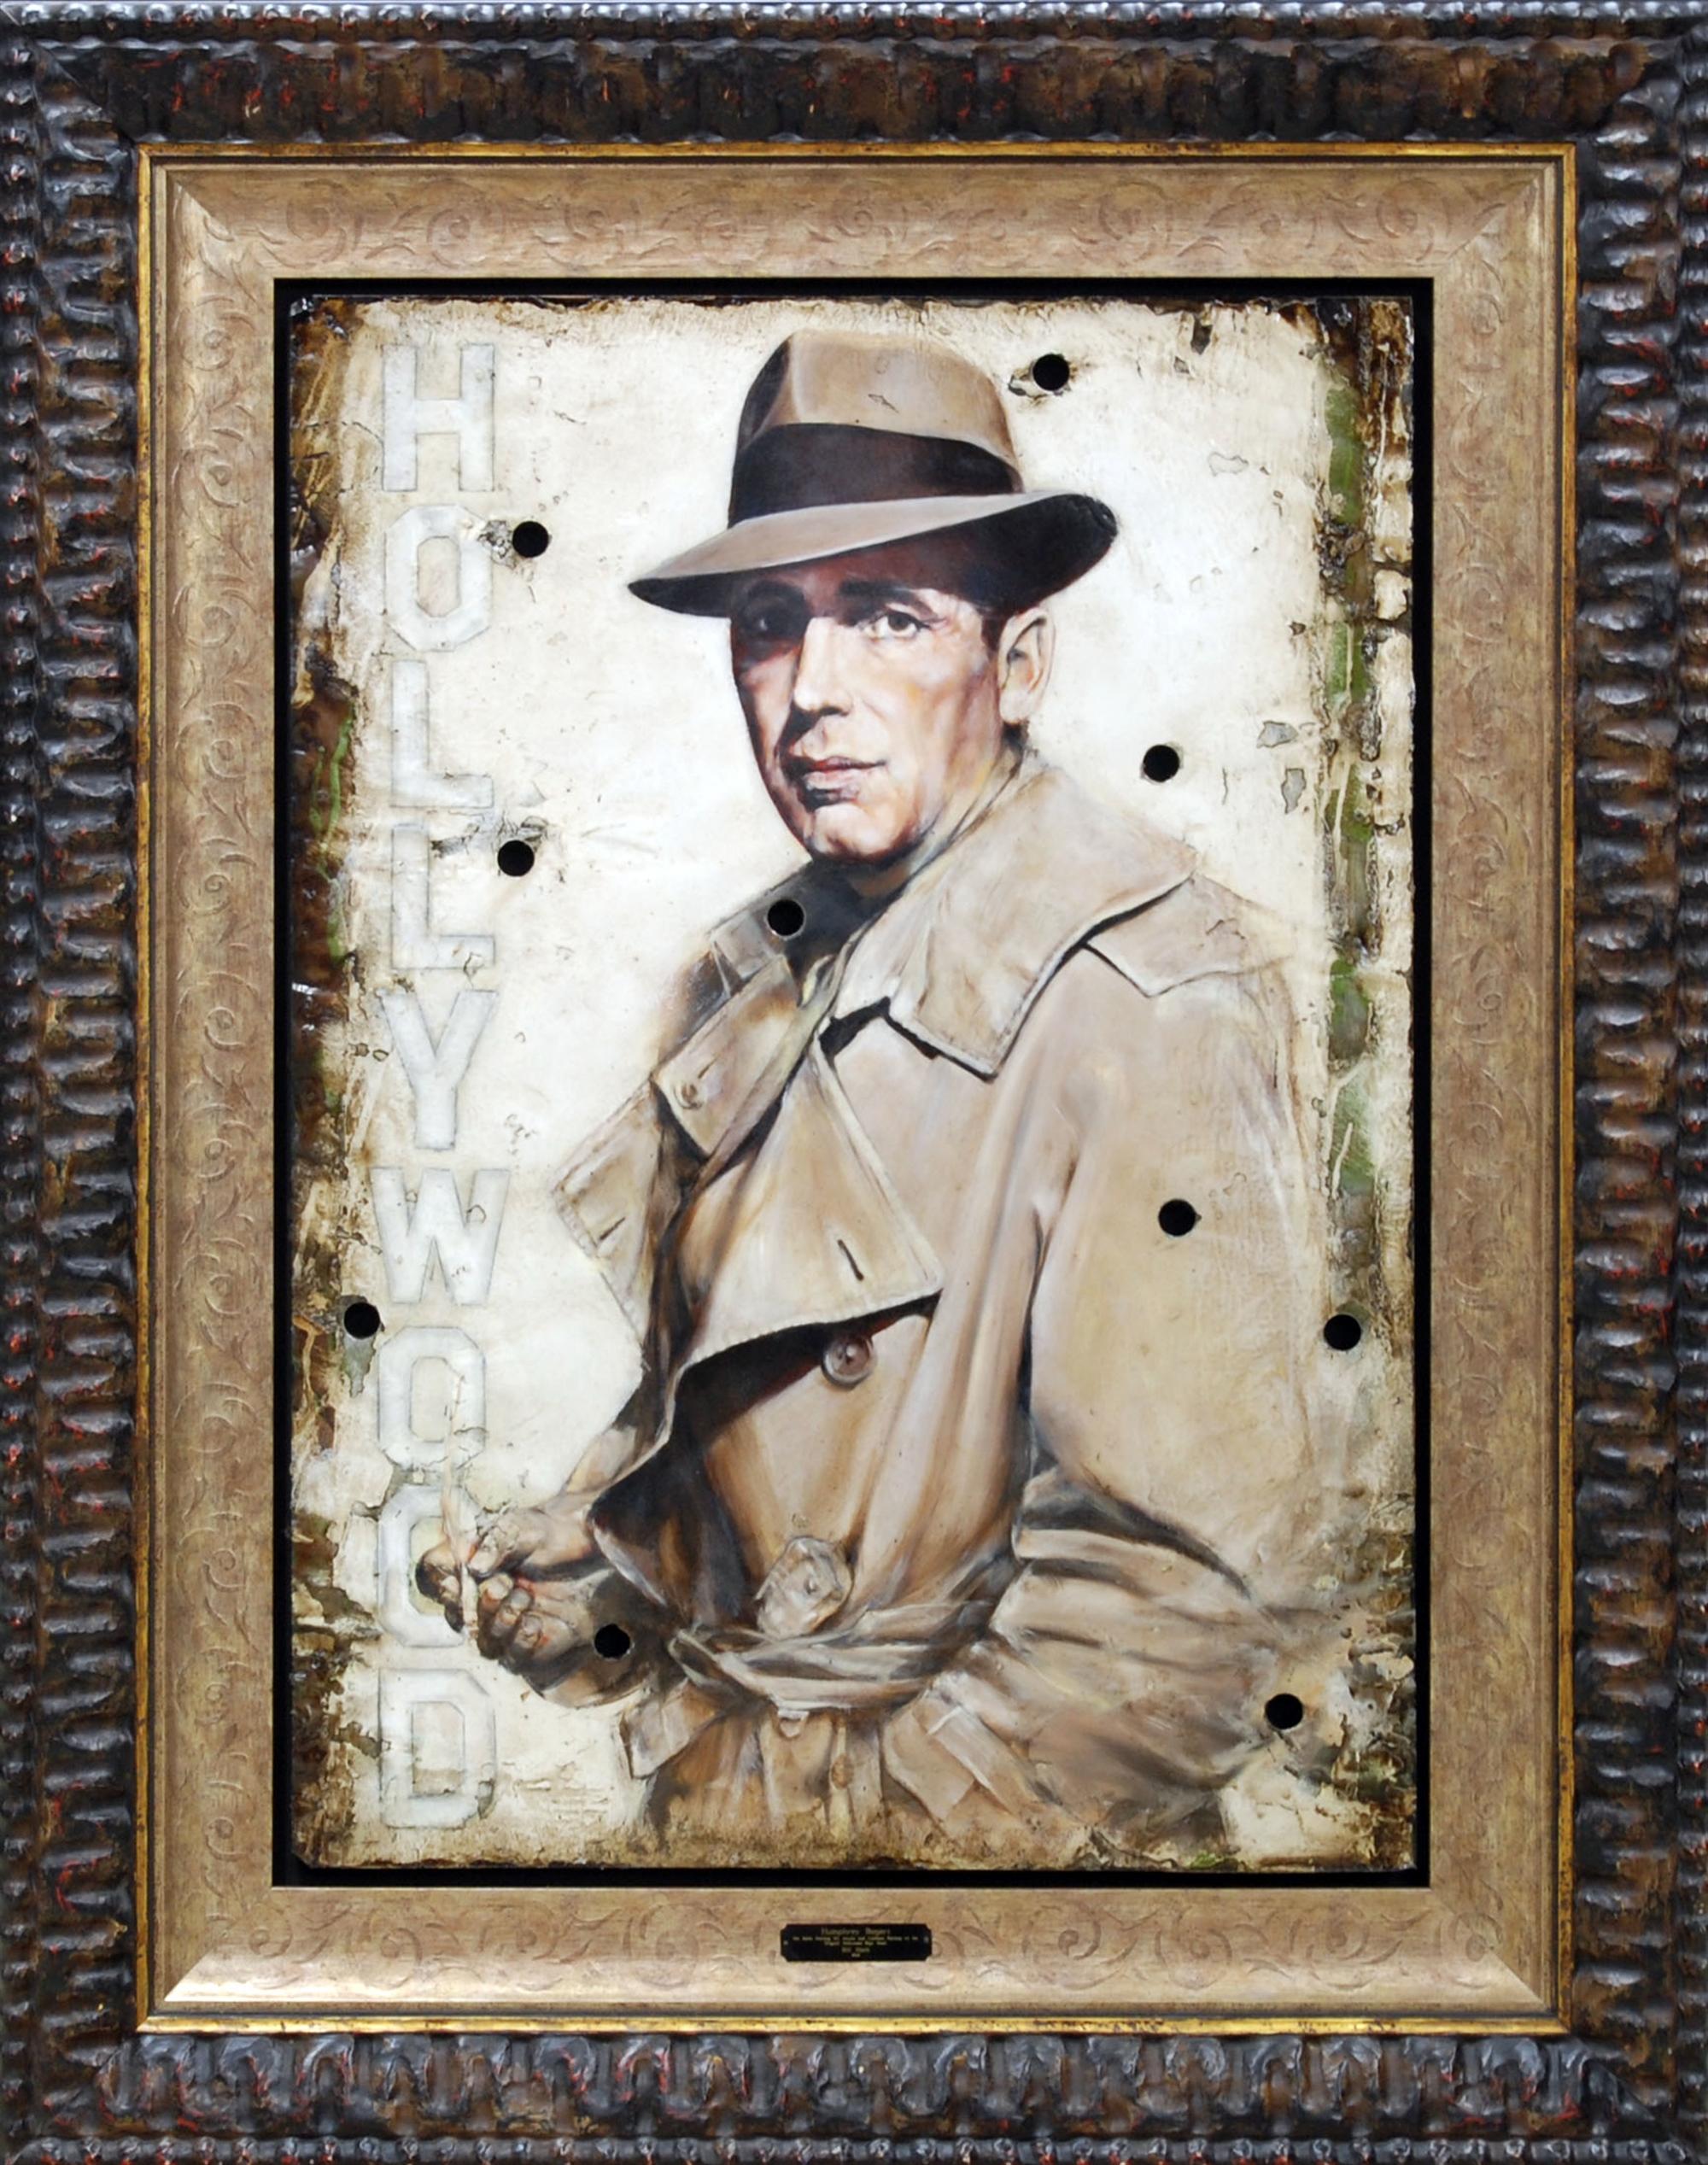 Humphrey Bogart #1 by Bill Mack